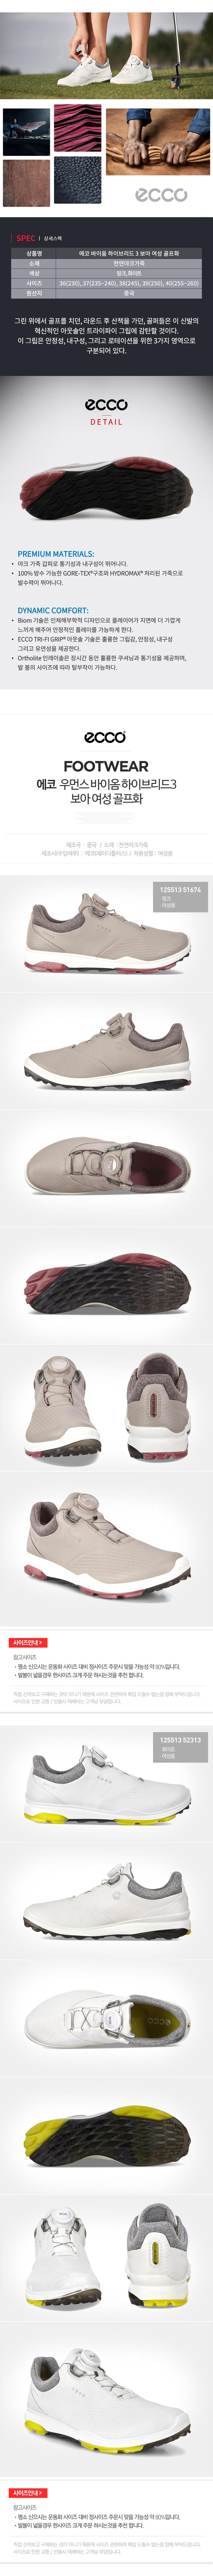 ecco_biom_hybrid3_boa_w_shoes_20.jpg